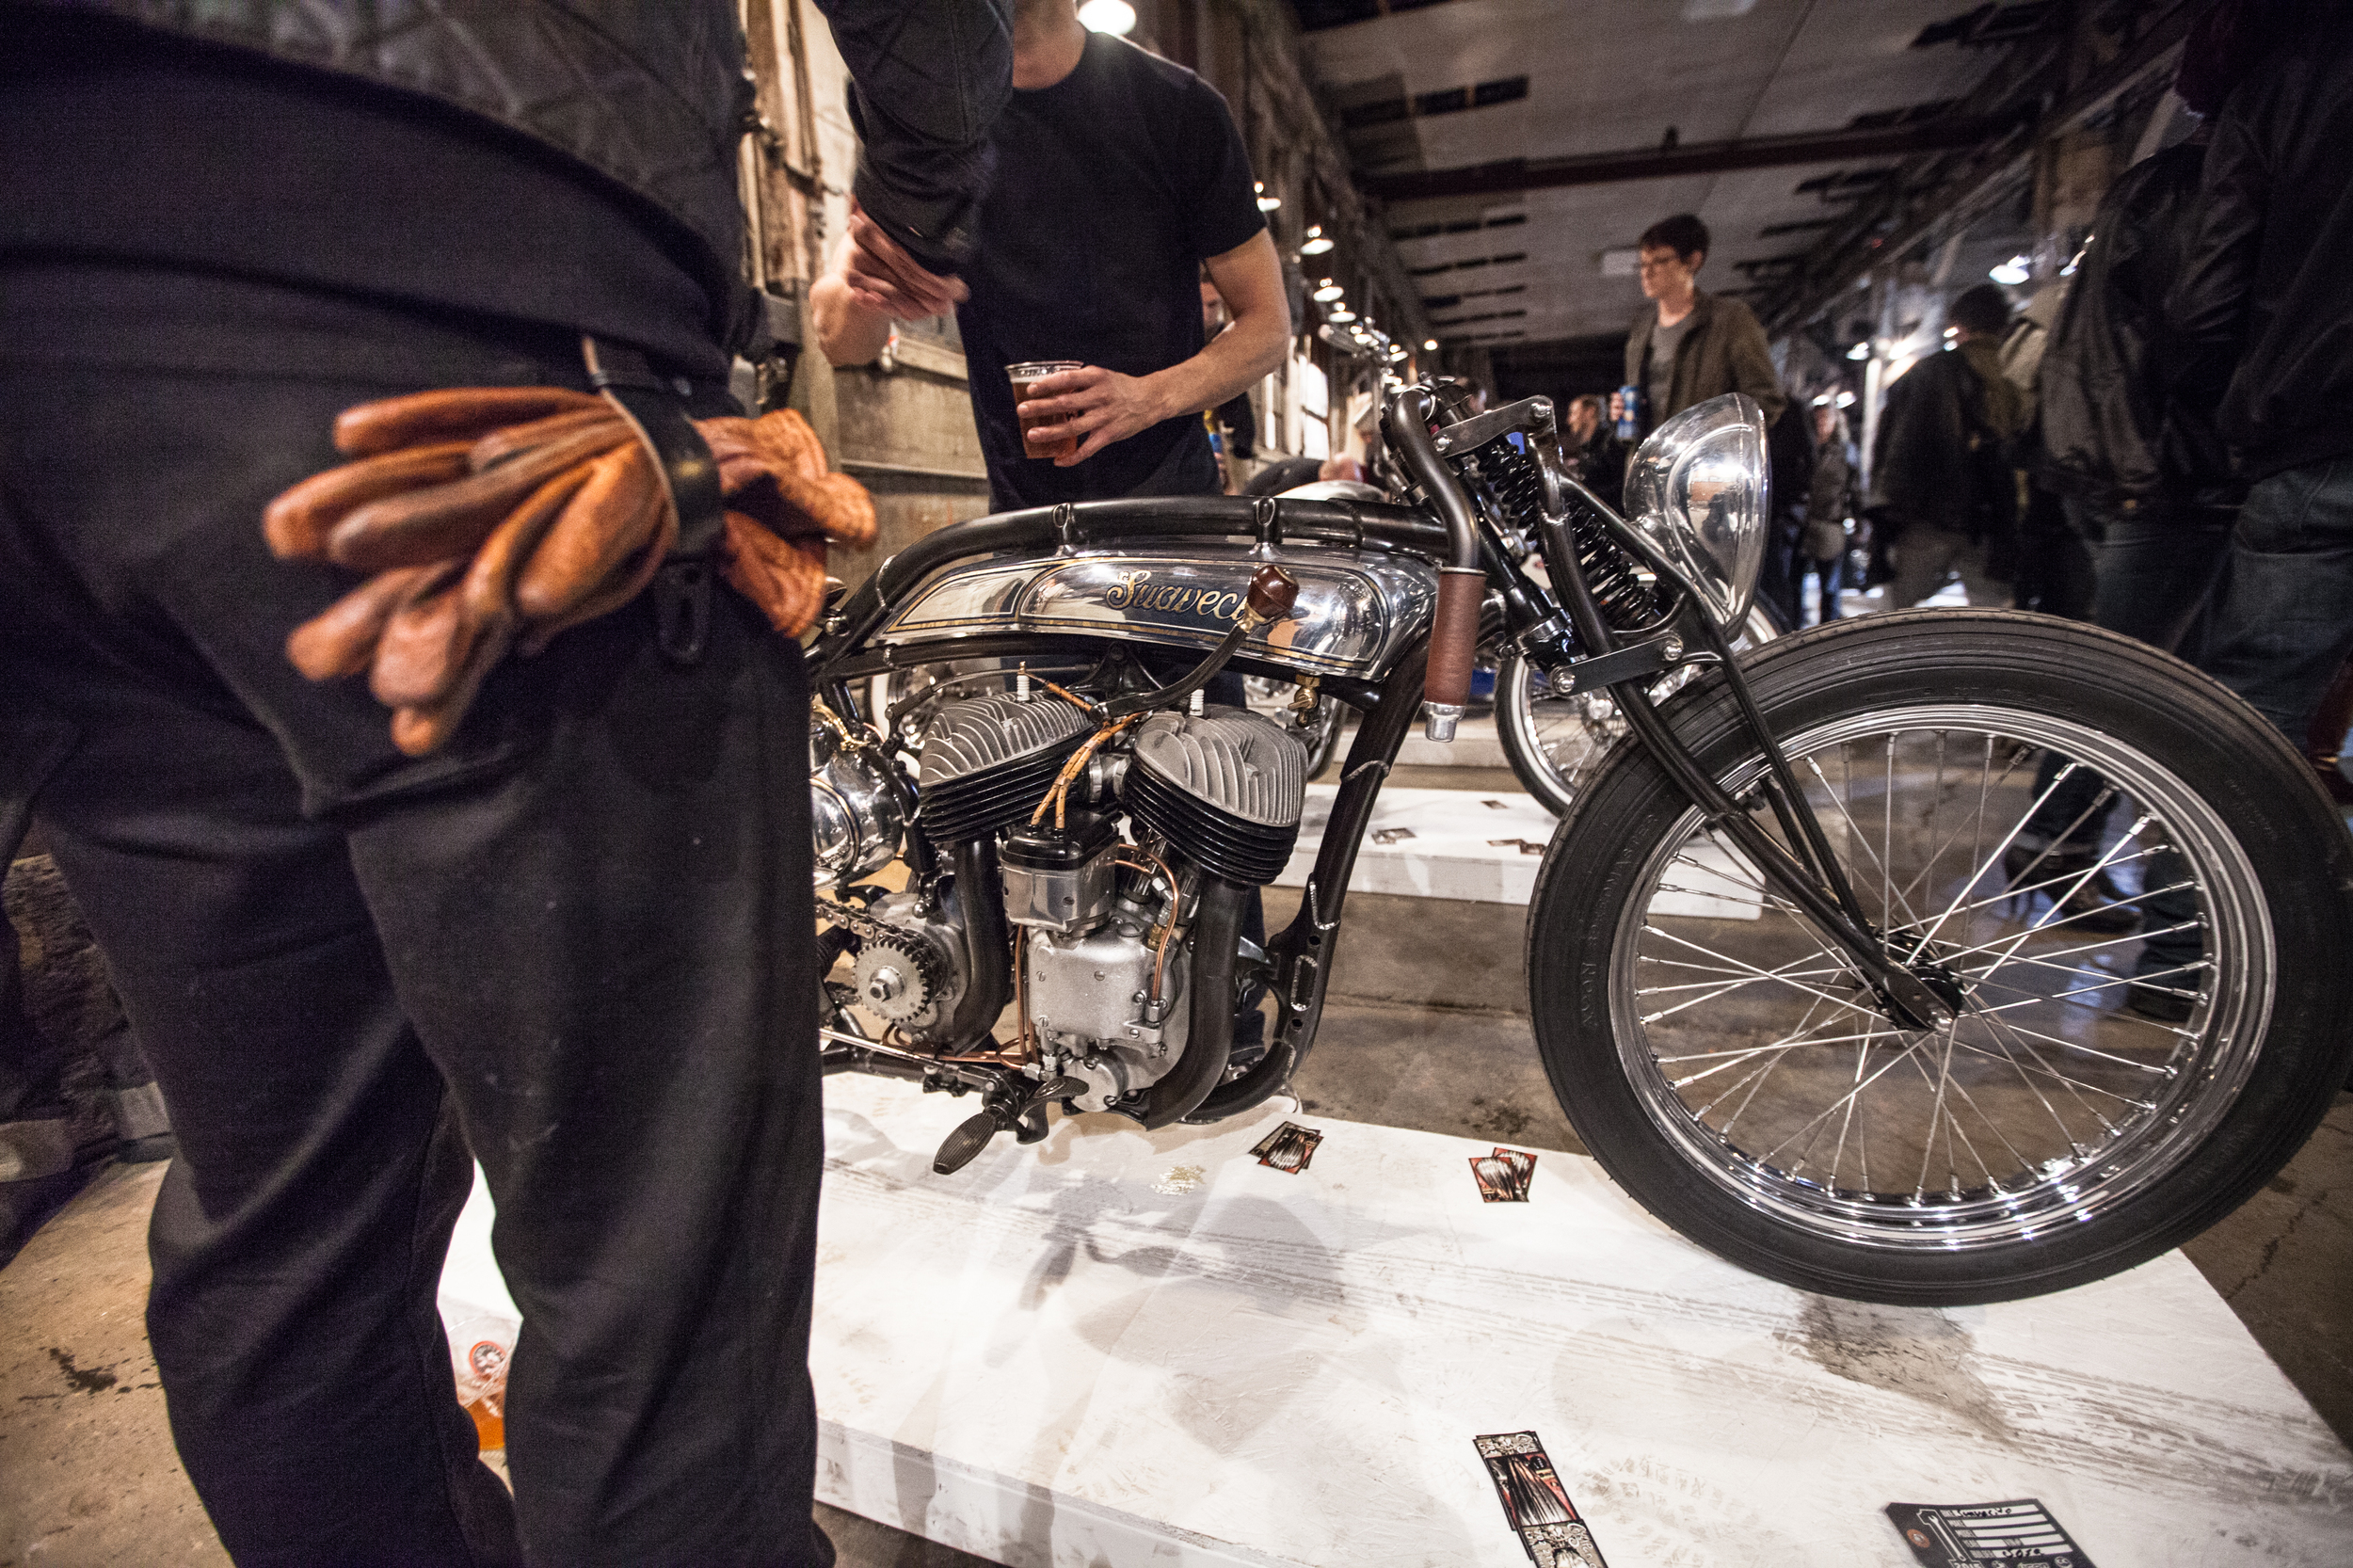 02-14-15 The 1 Moto Show - 1_-130-8.jpg